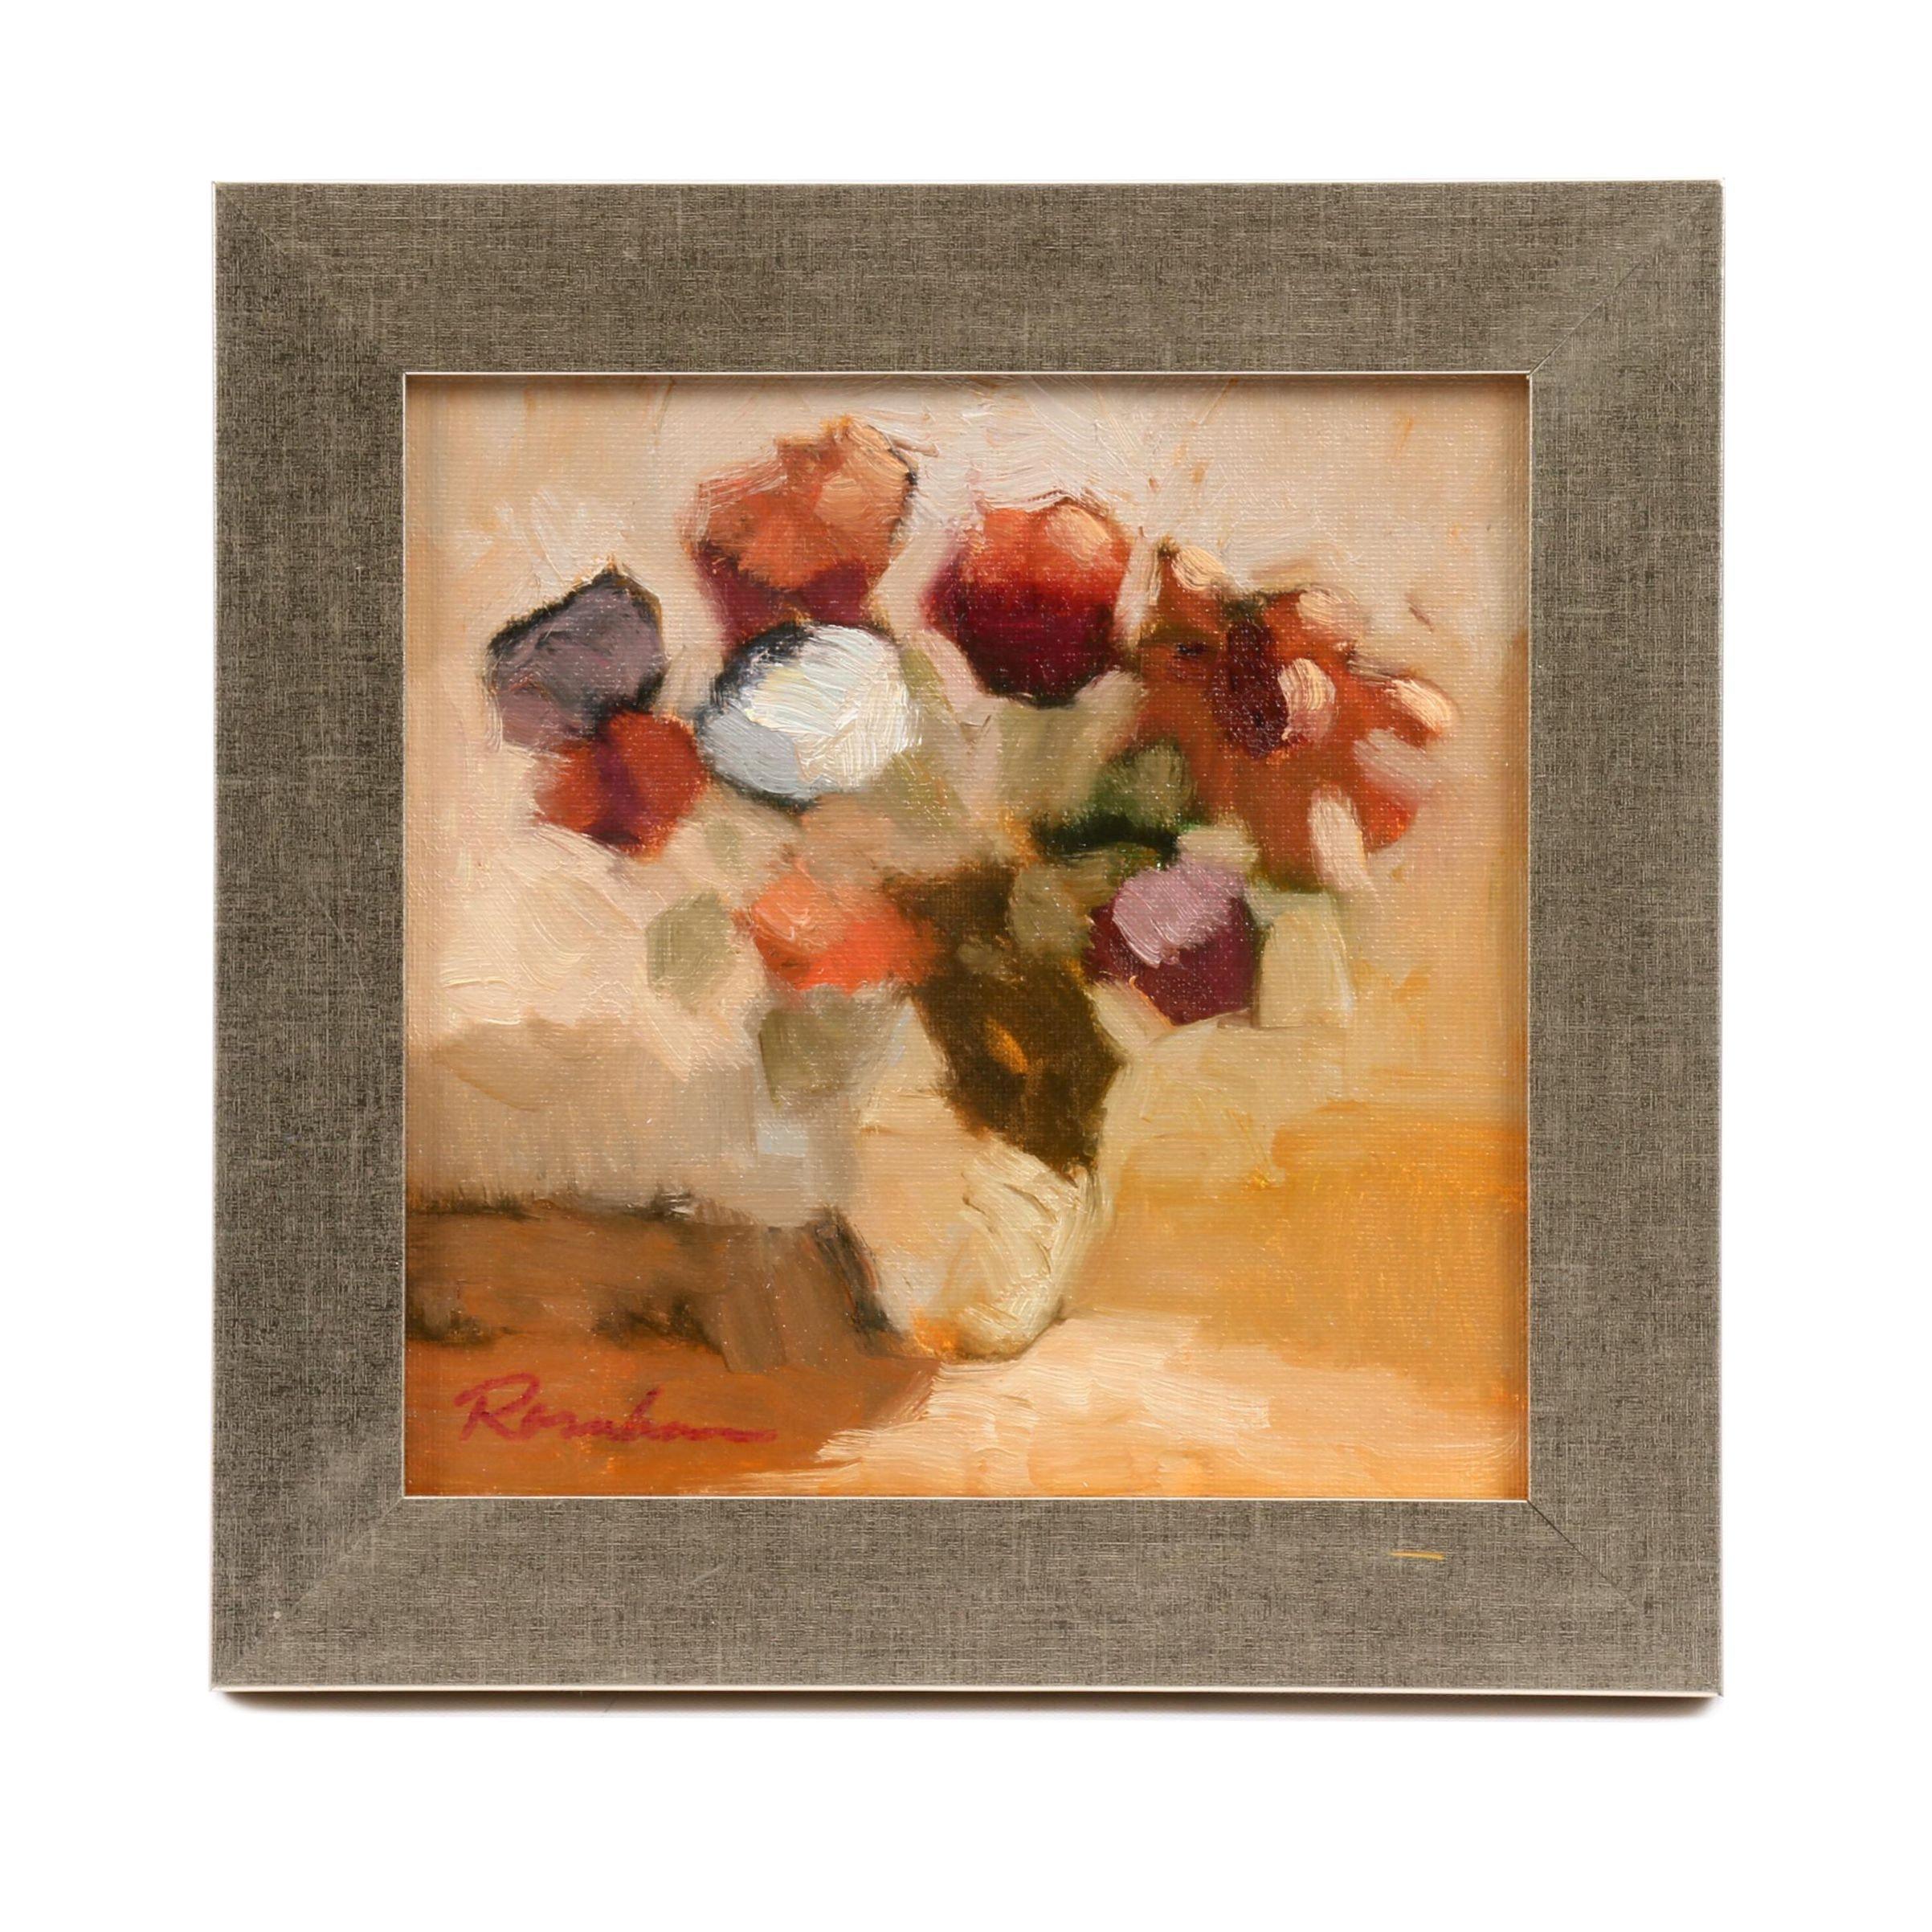 Salley Rosenbaum Floral Still Life Oil Painting